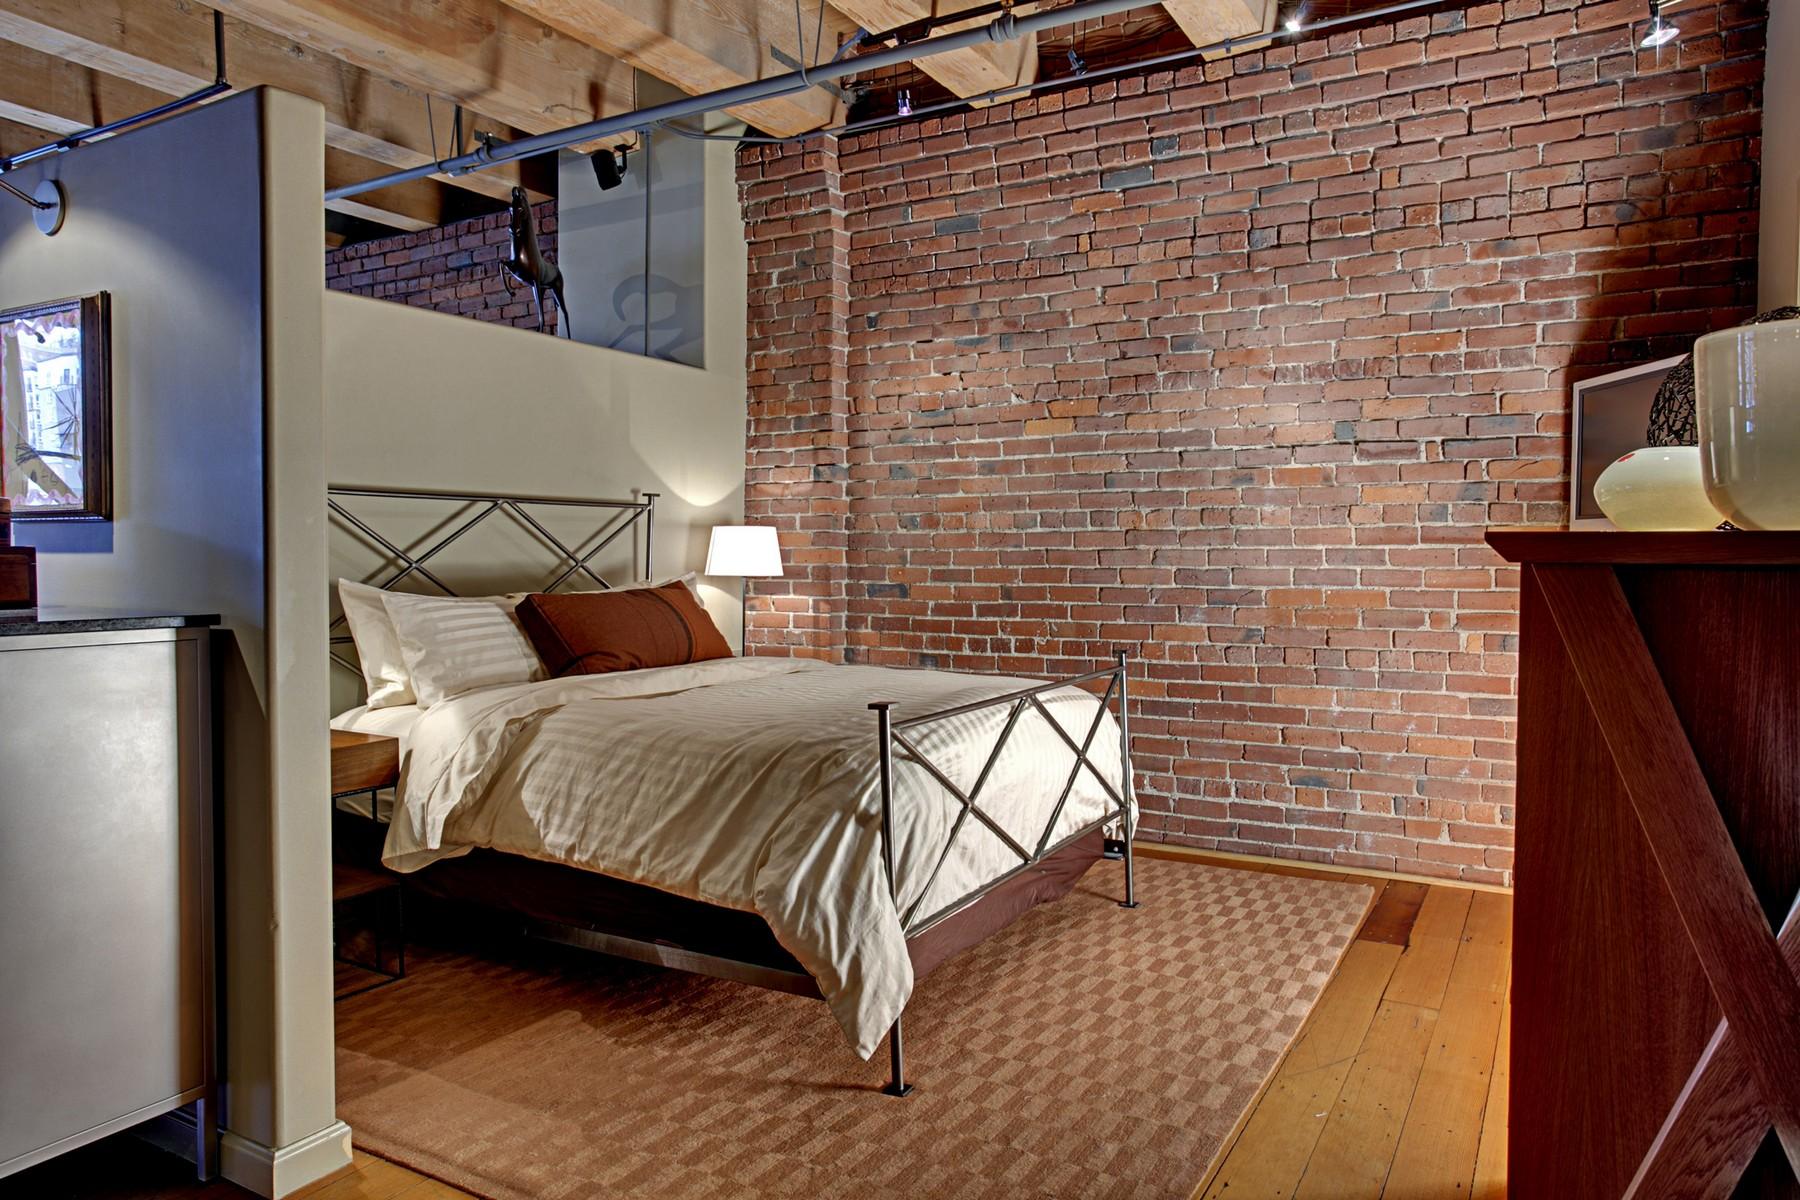 4 Bedroom01.jpg